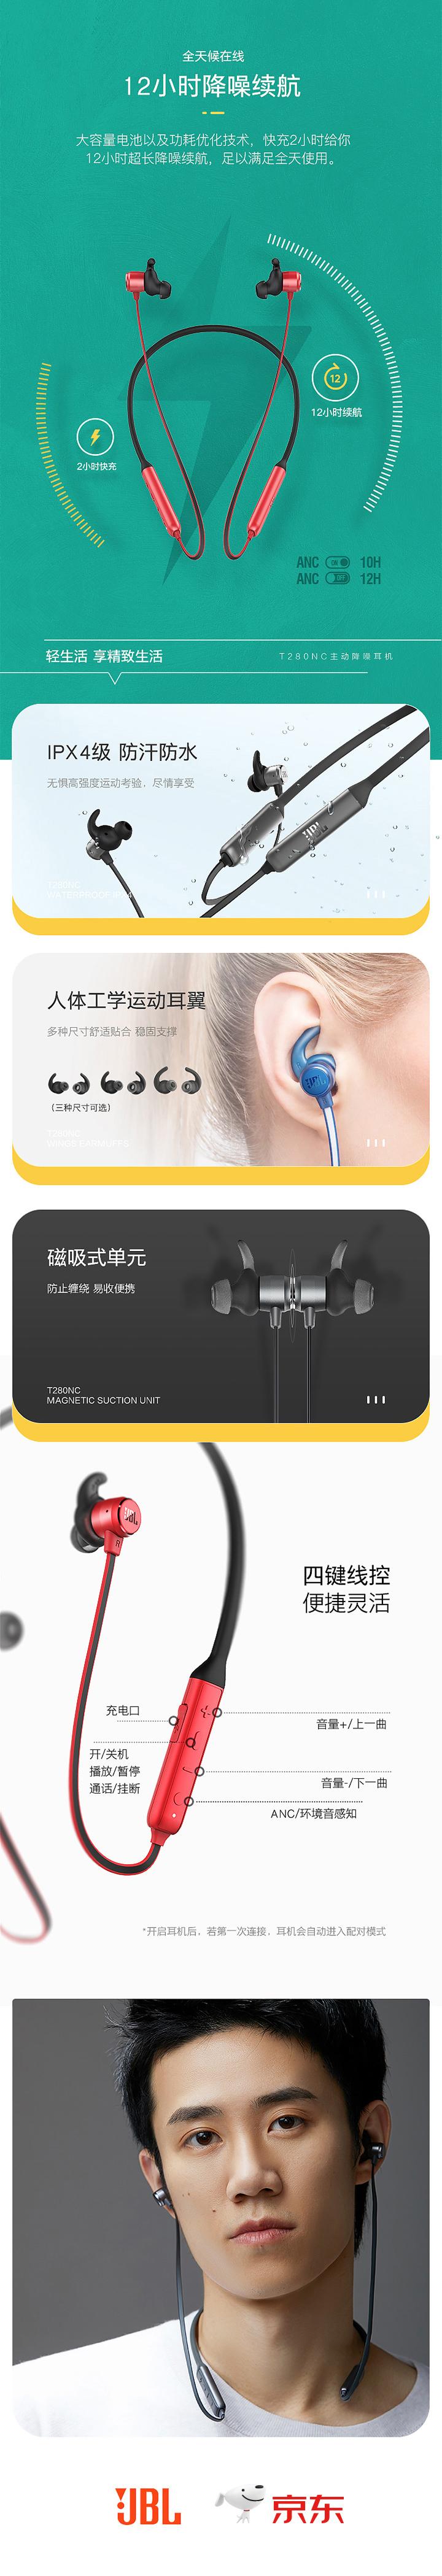 JBL T280NC无线降噪蓝牙耳机免费试用,评测